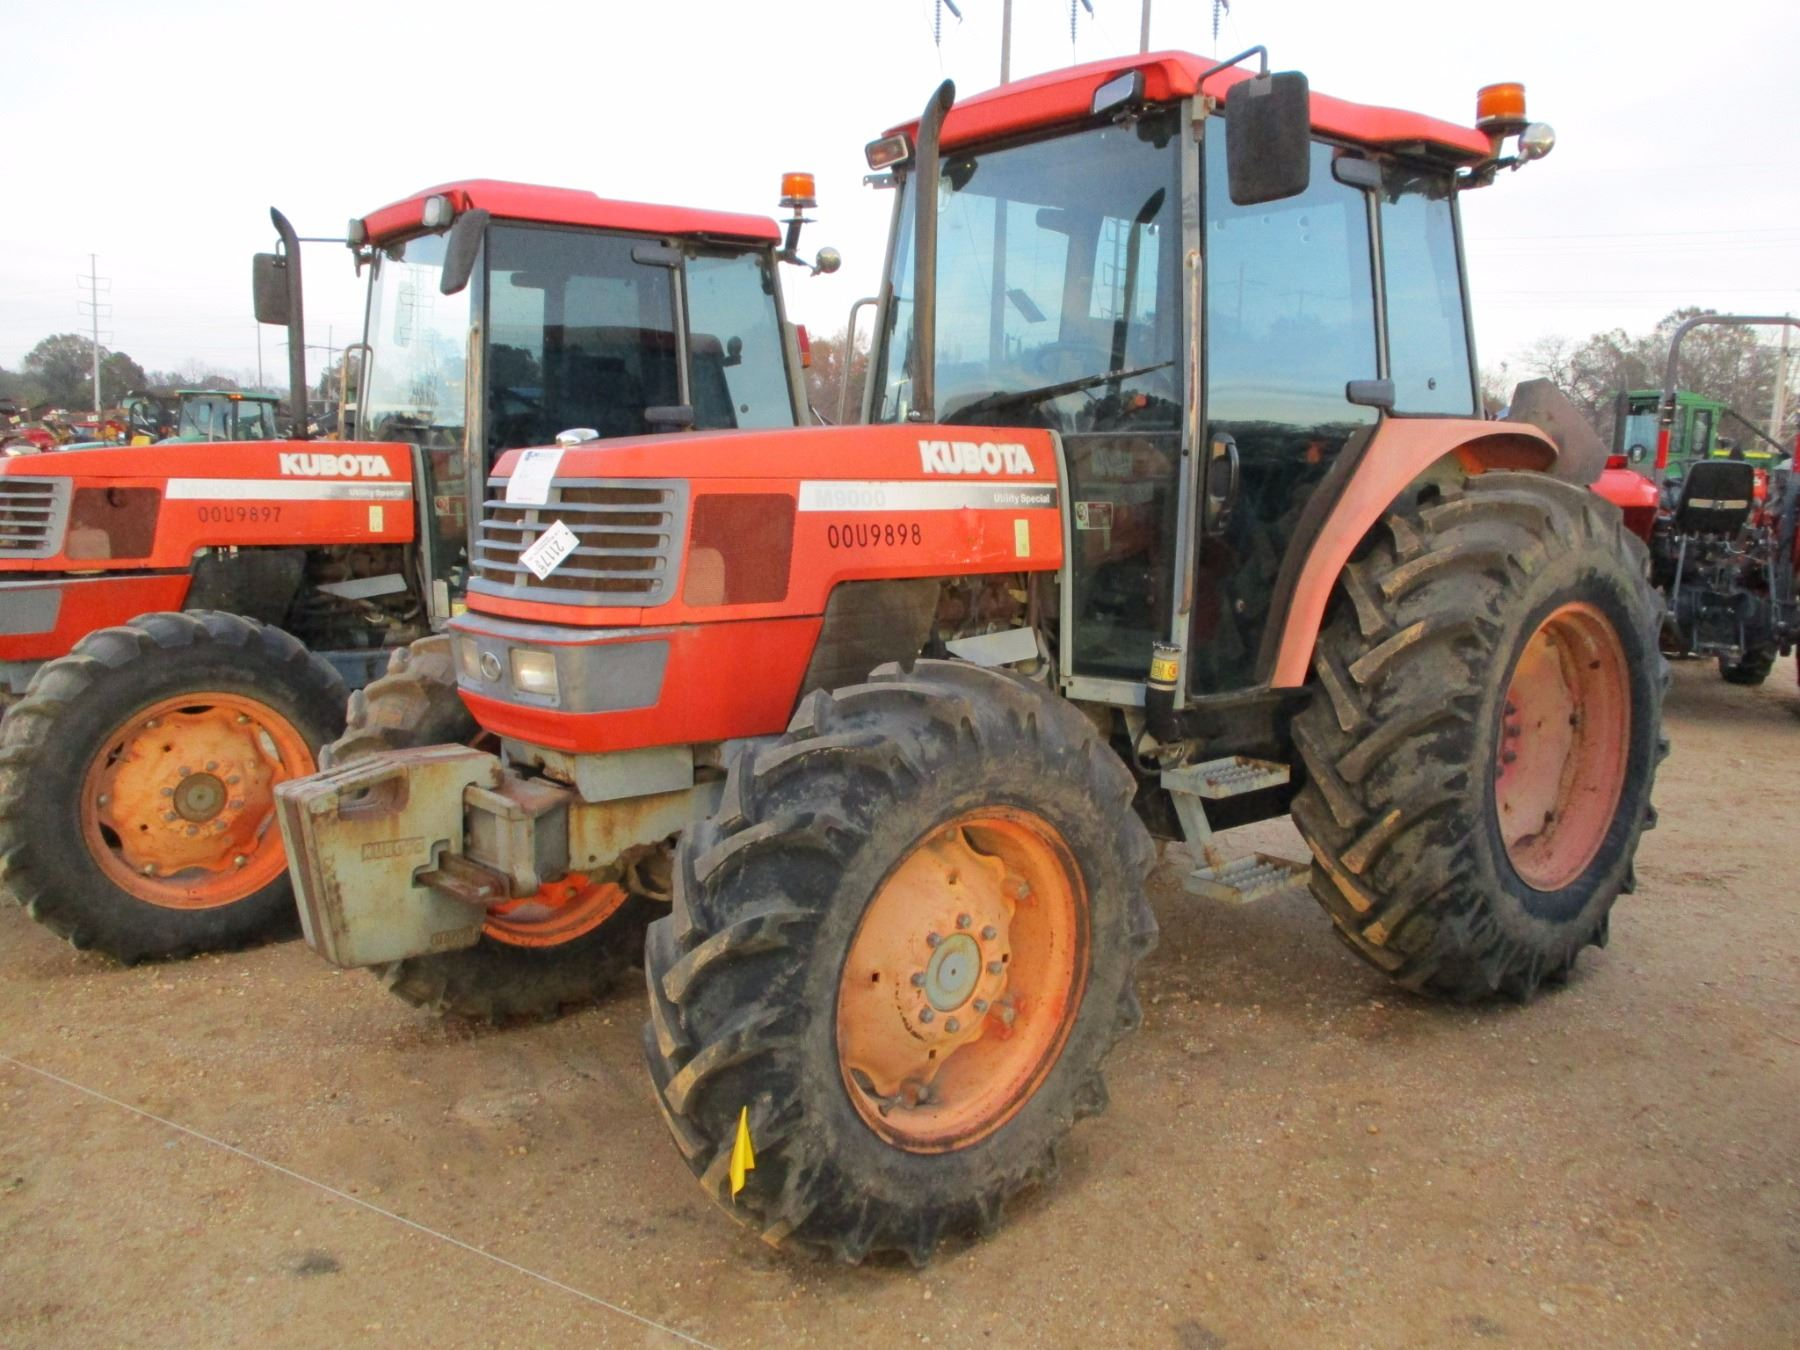 KUBOTA M9000 FARM TRACTOR, VIN/SN:53234 - MFWD, 3 REMOTES, ECAB W/AC,  18 4-30 TIRES, METER READING 4